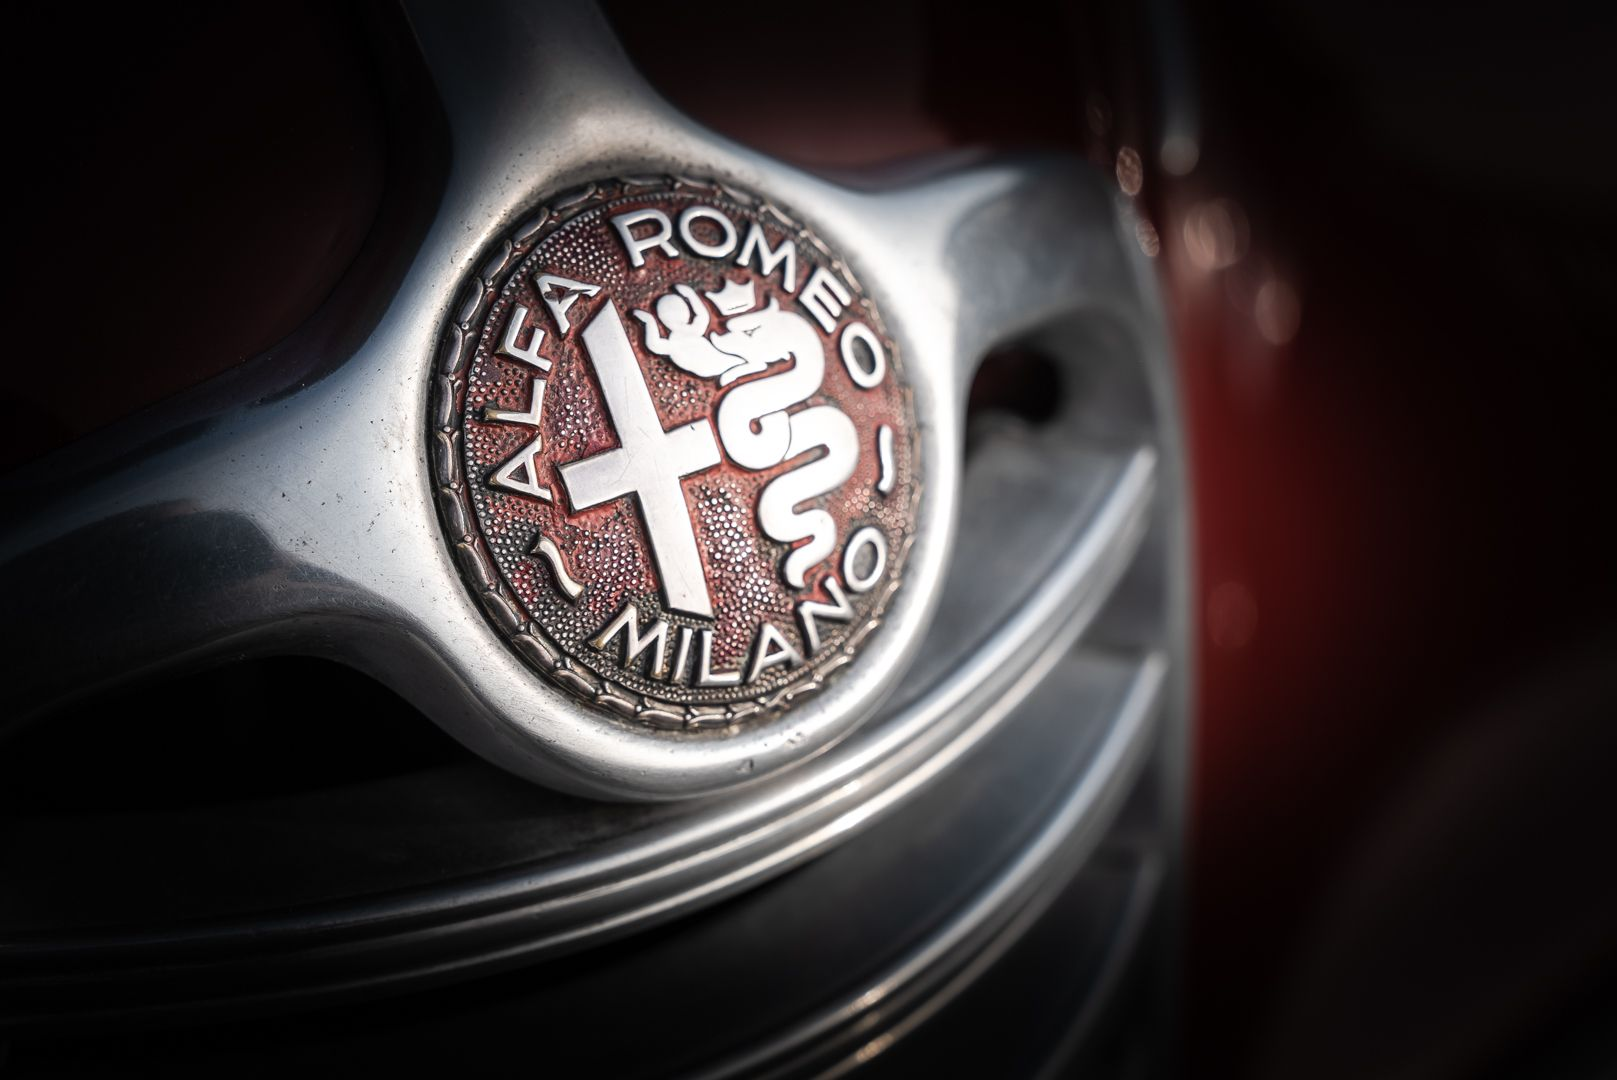 1947 Alfa Romeo Freccia d'oro 6C 2500 Sport 61710